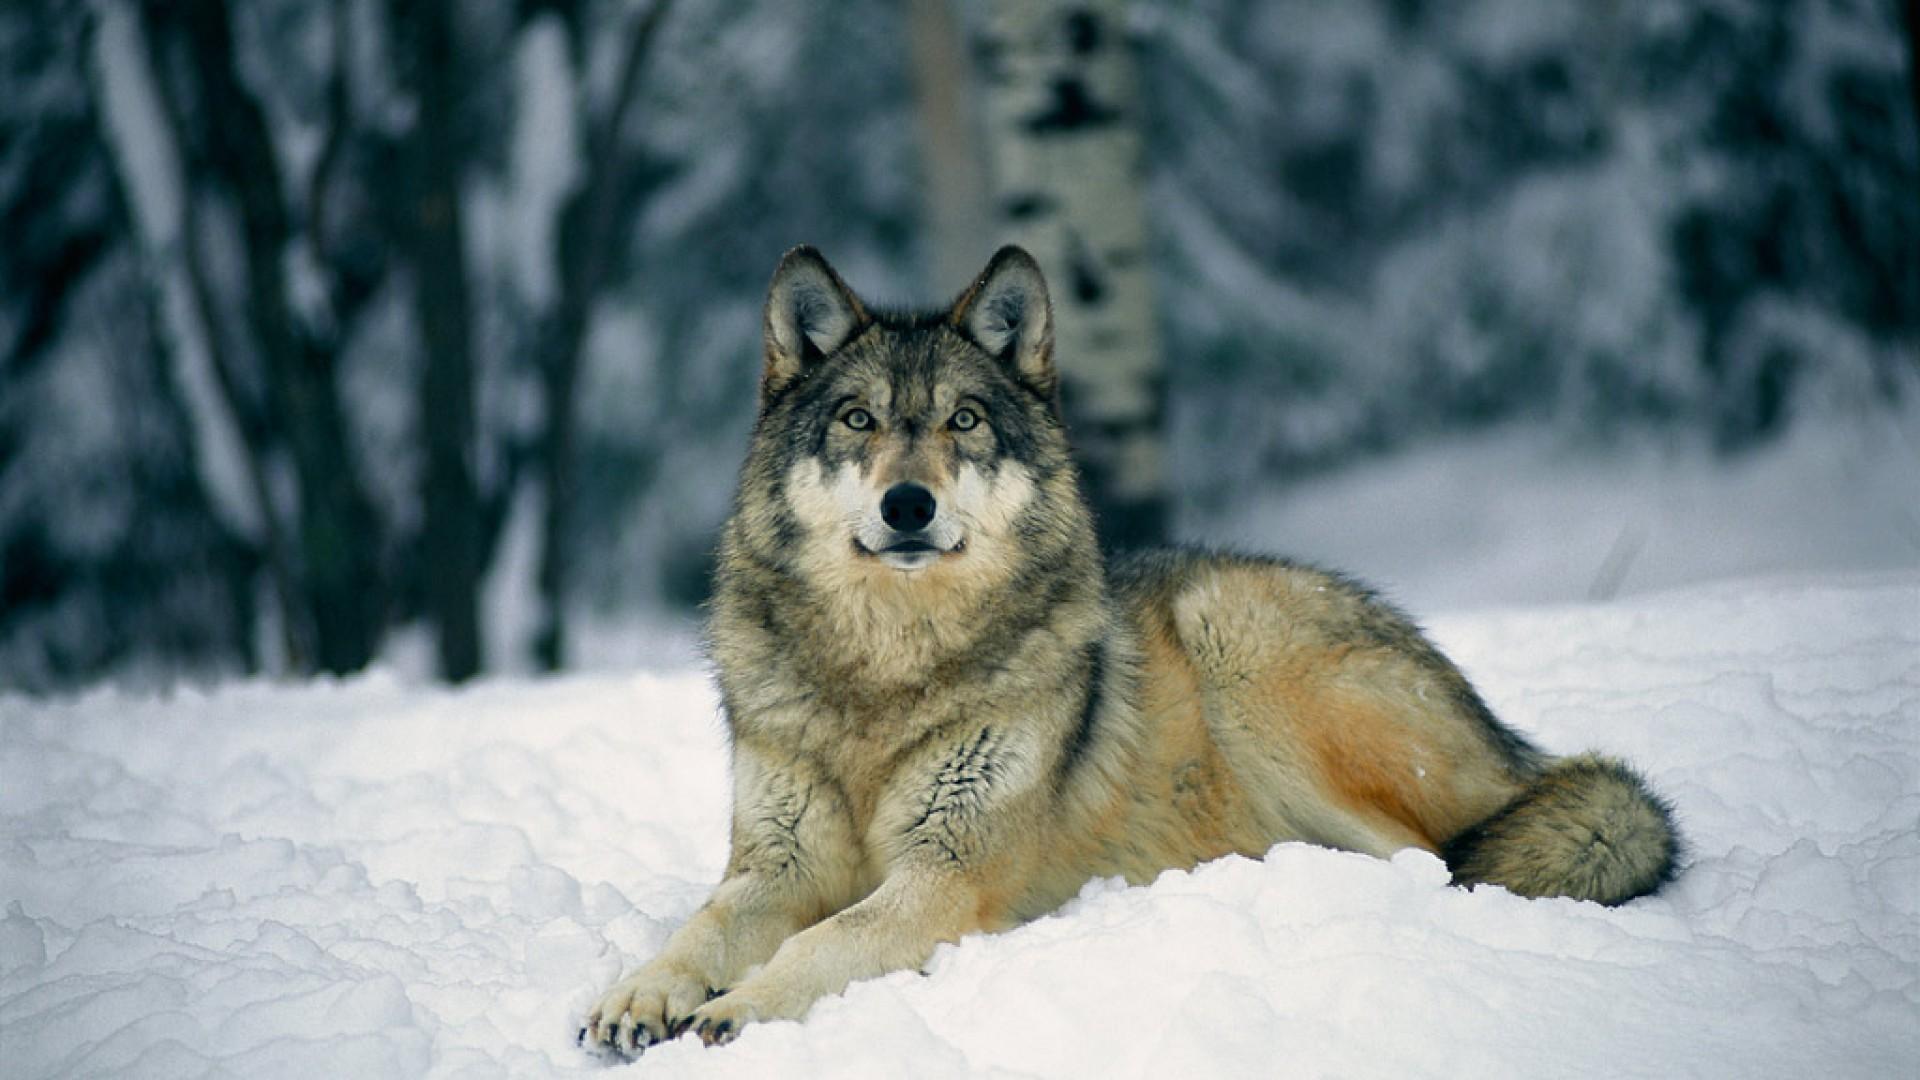 Wolf wallpaper HD ·① Download free amazing full HD ...